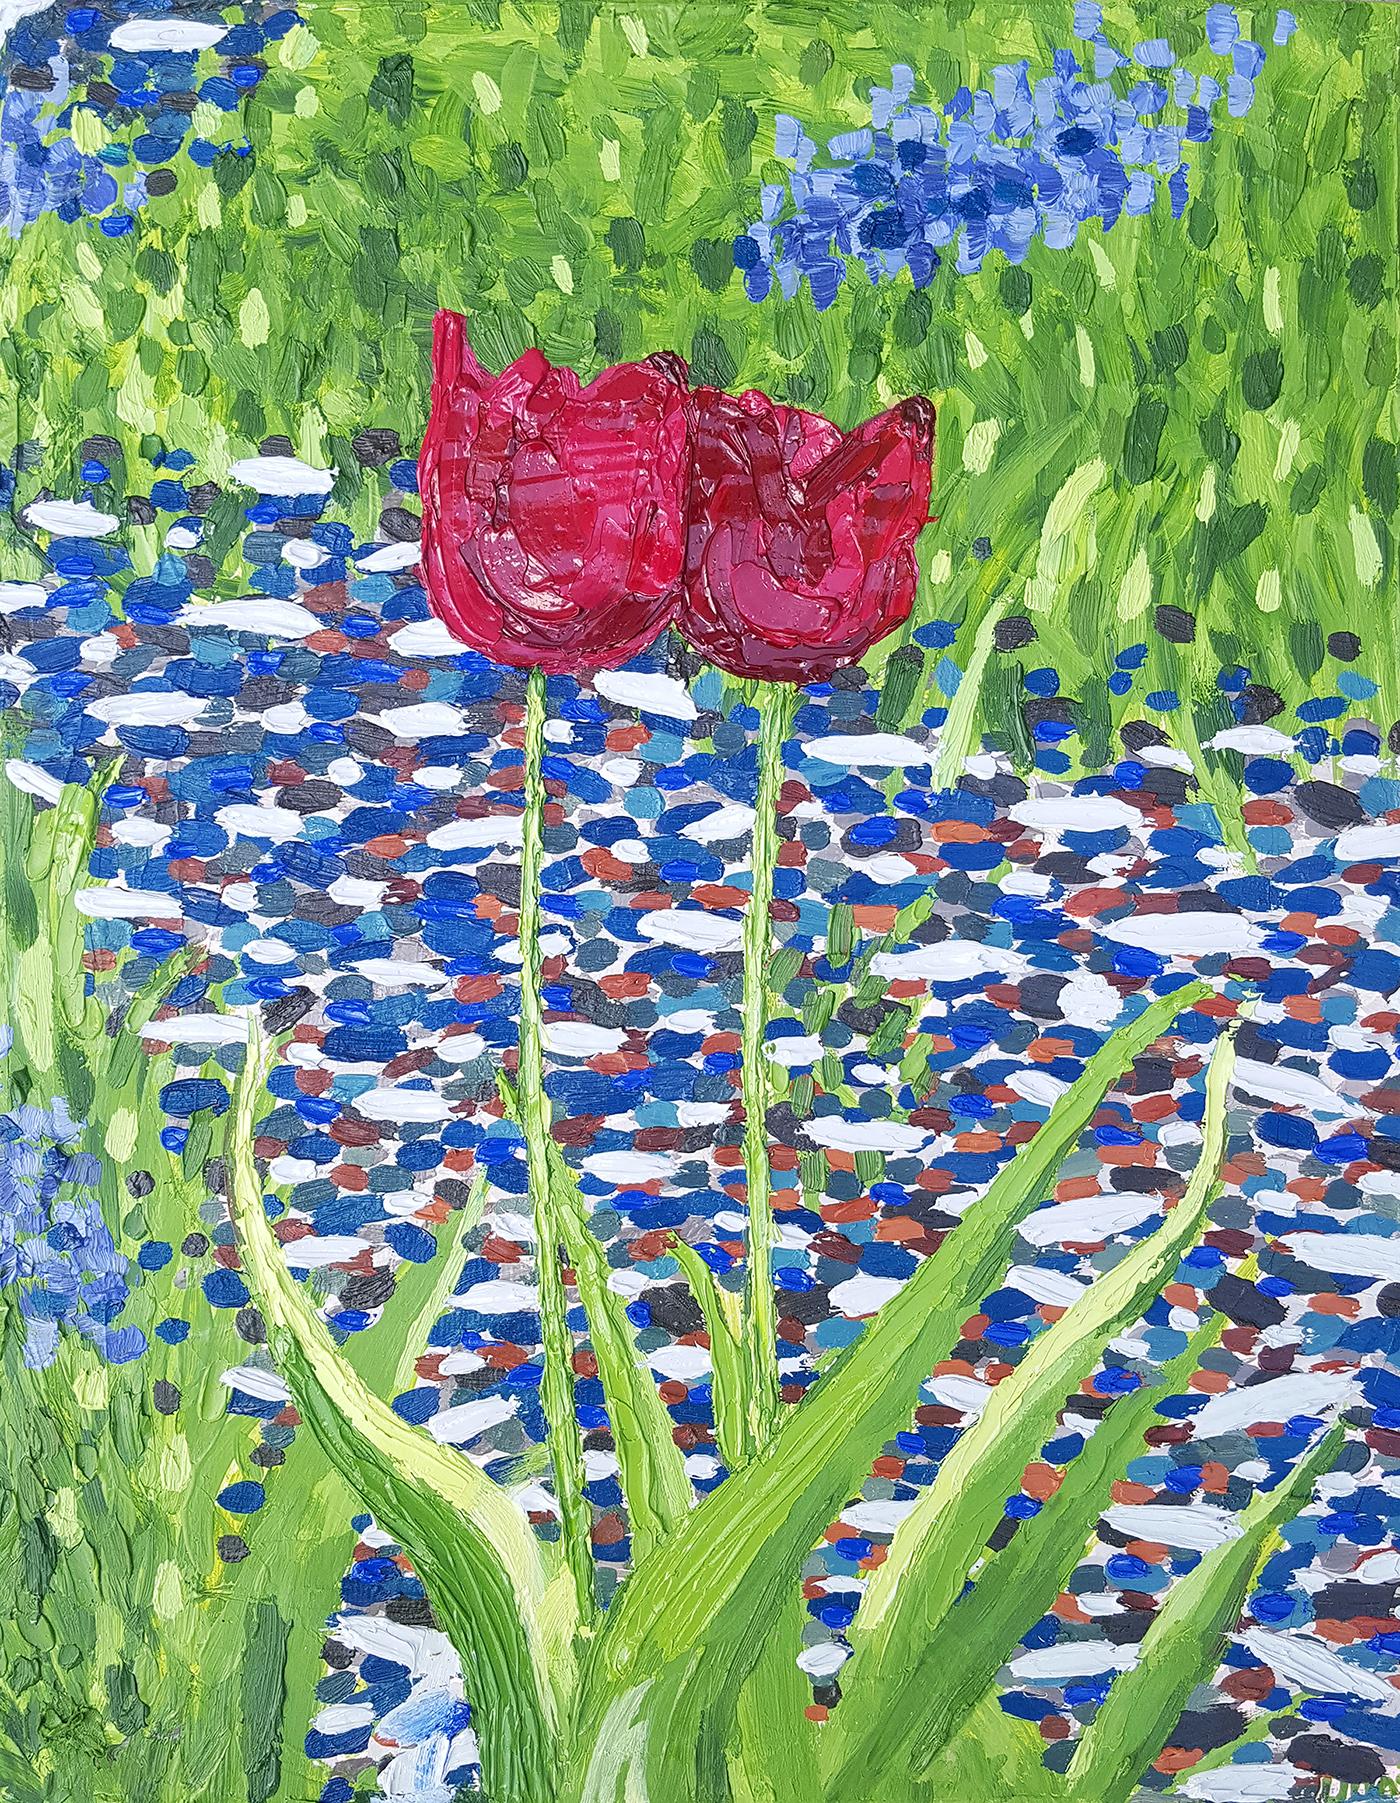 dbg_tulips_highres_150dpi_websm.jpg